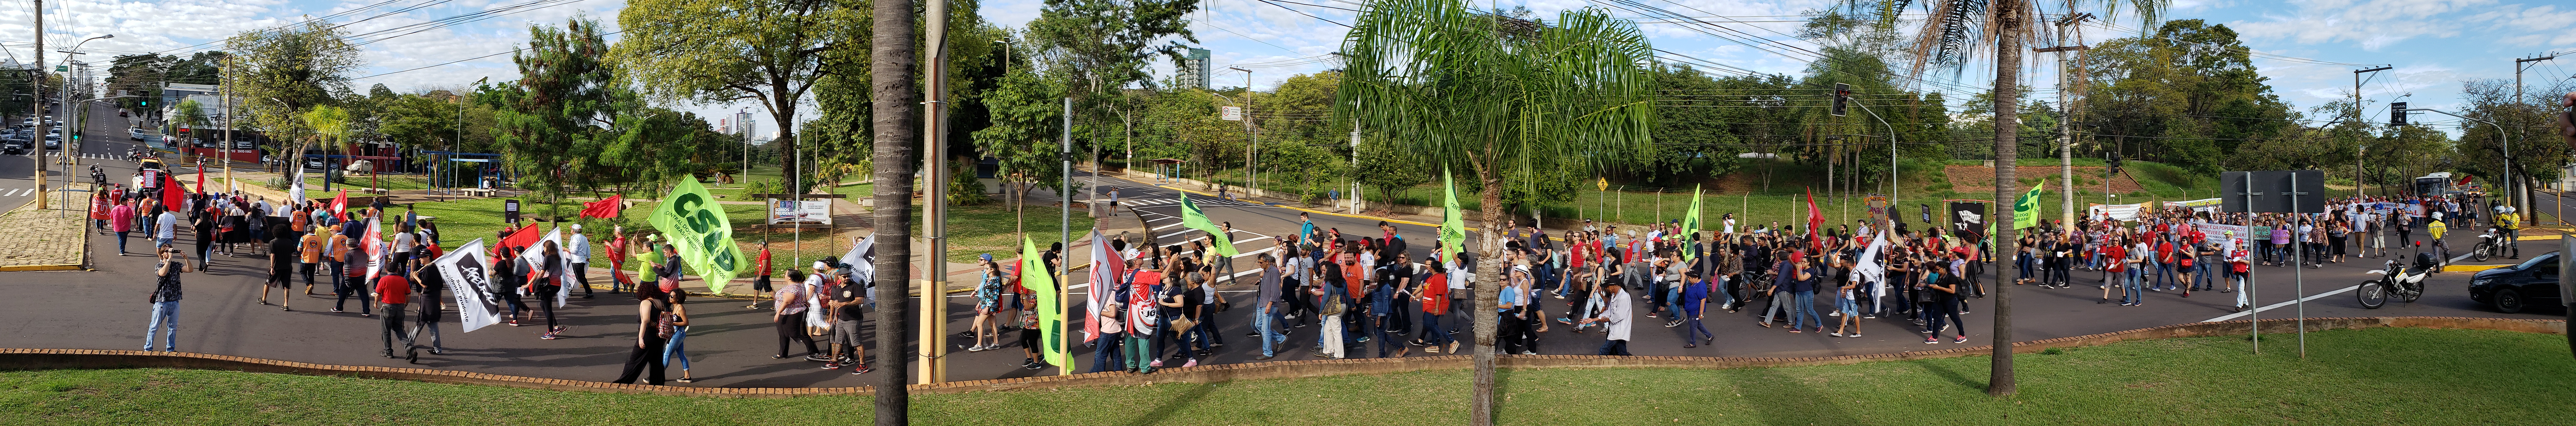 Sintrapp organiza dia de greve na base